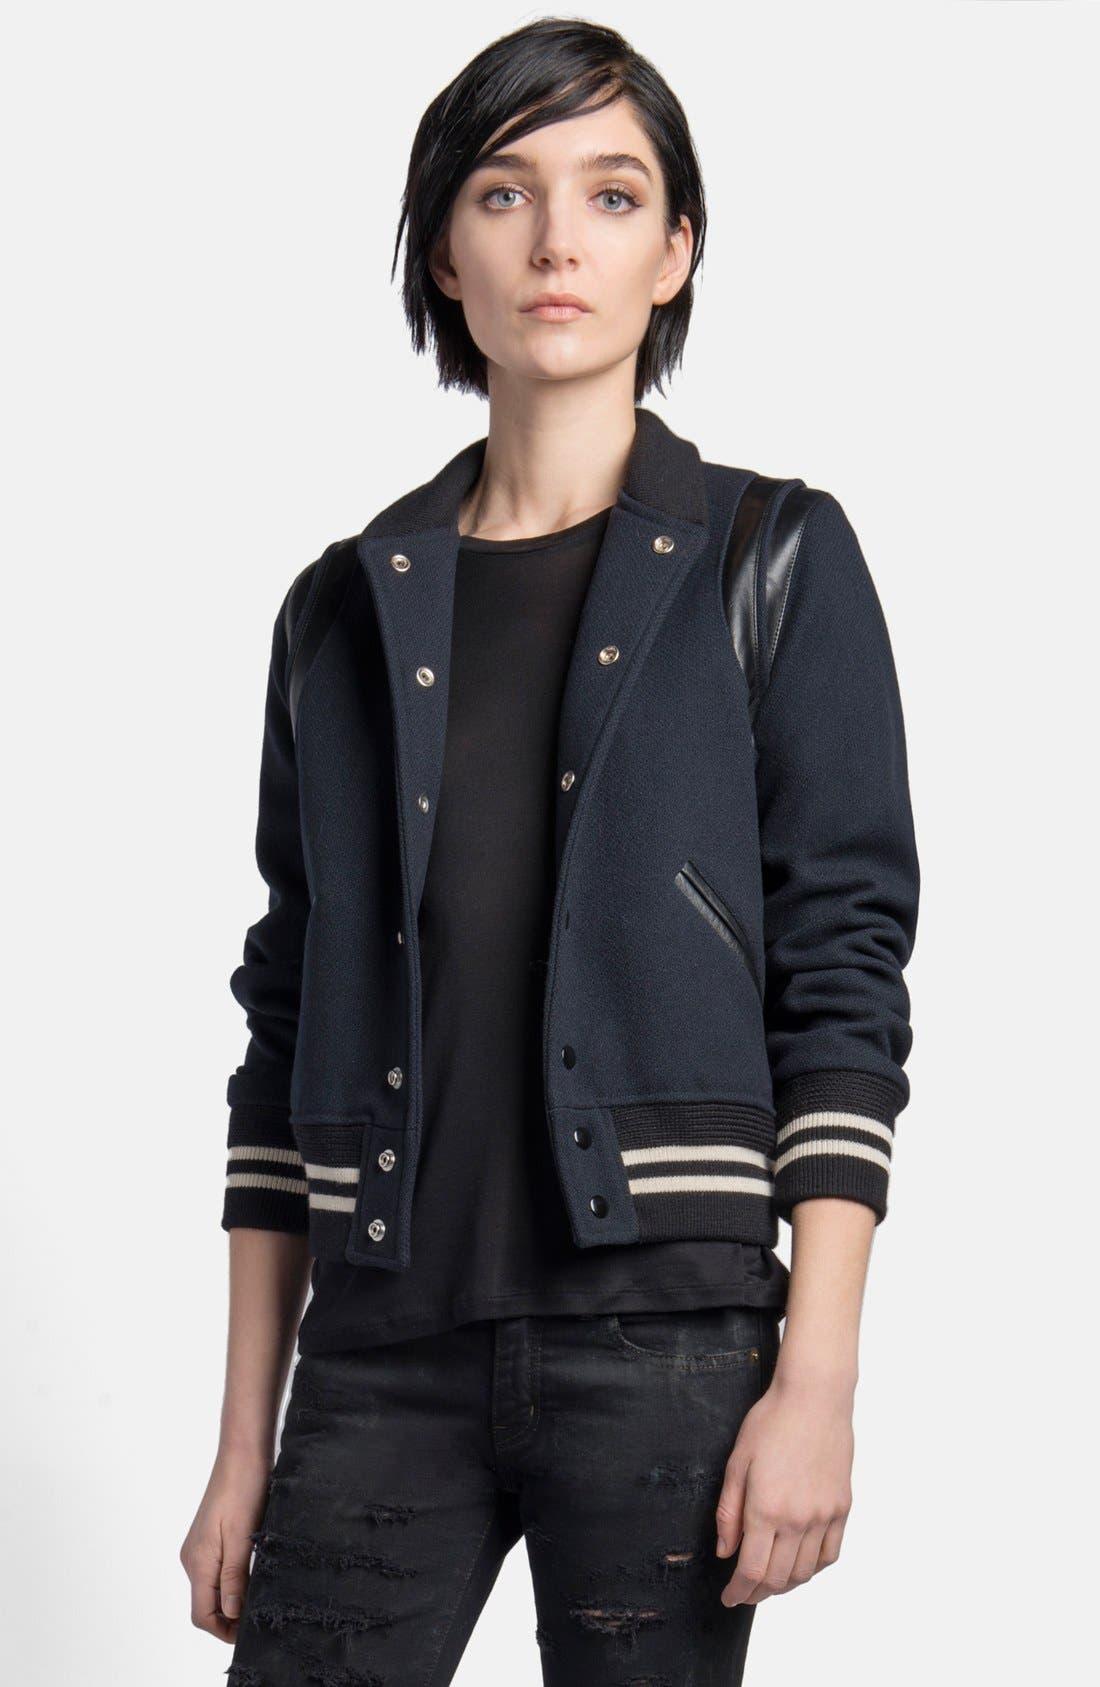 Main Image - Saint Laurent 'Teddy' Leather Trim Bomber Jacket